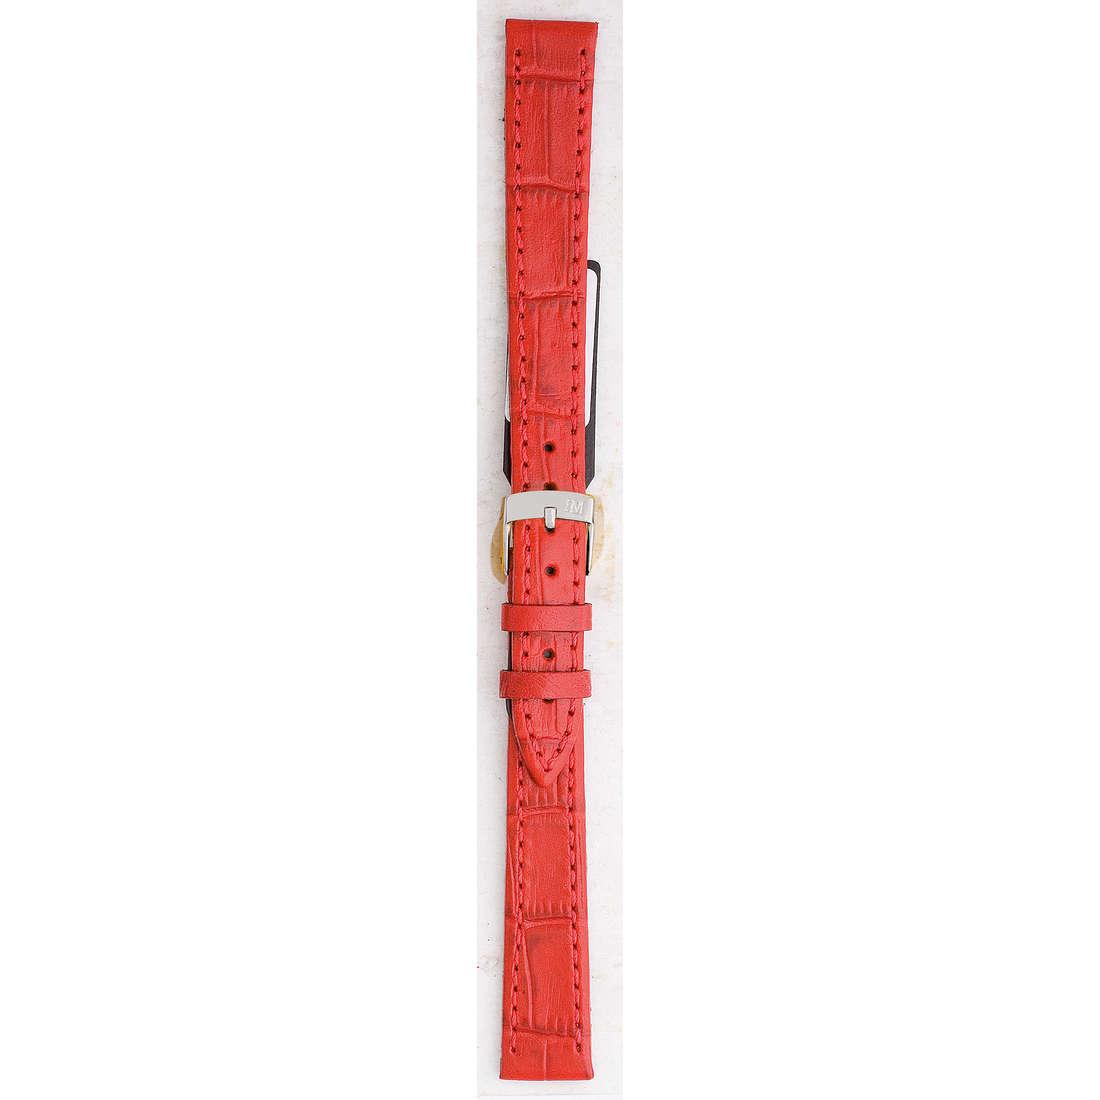 montre bande de montres unisex Morellato I Lunghi A01Y2524656083CR20